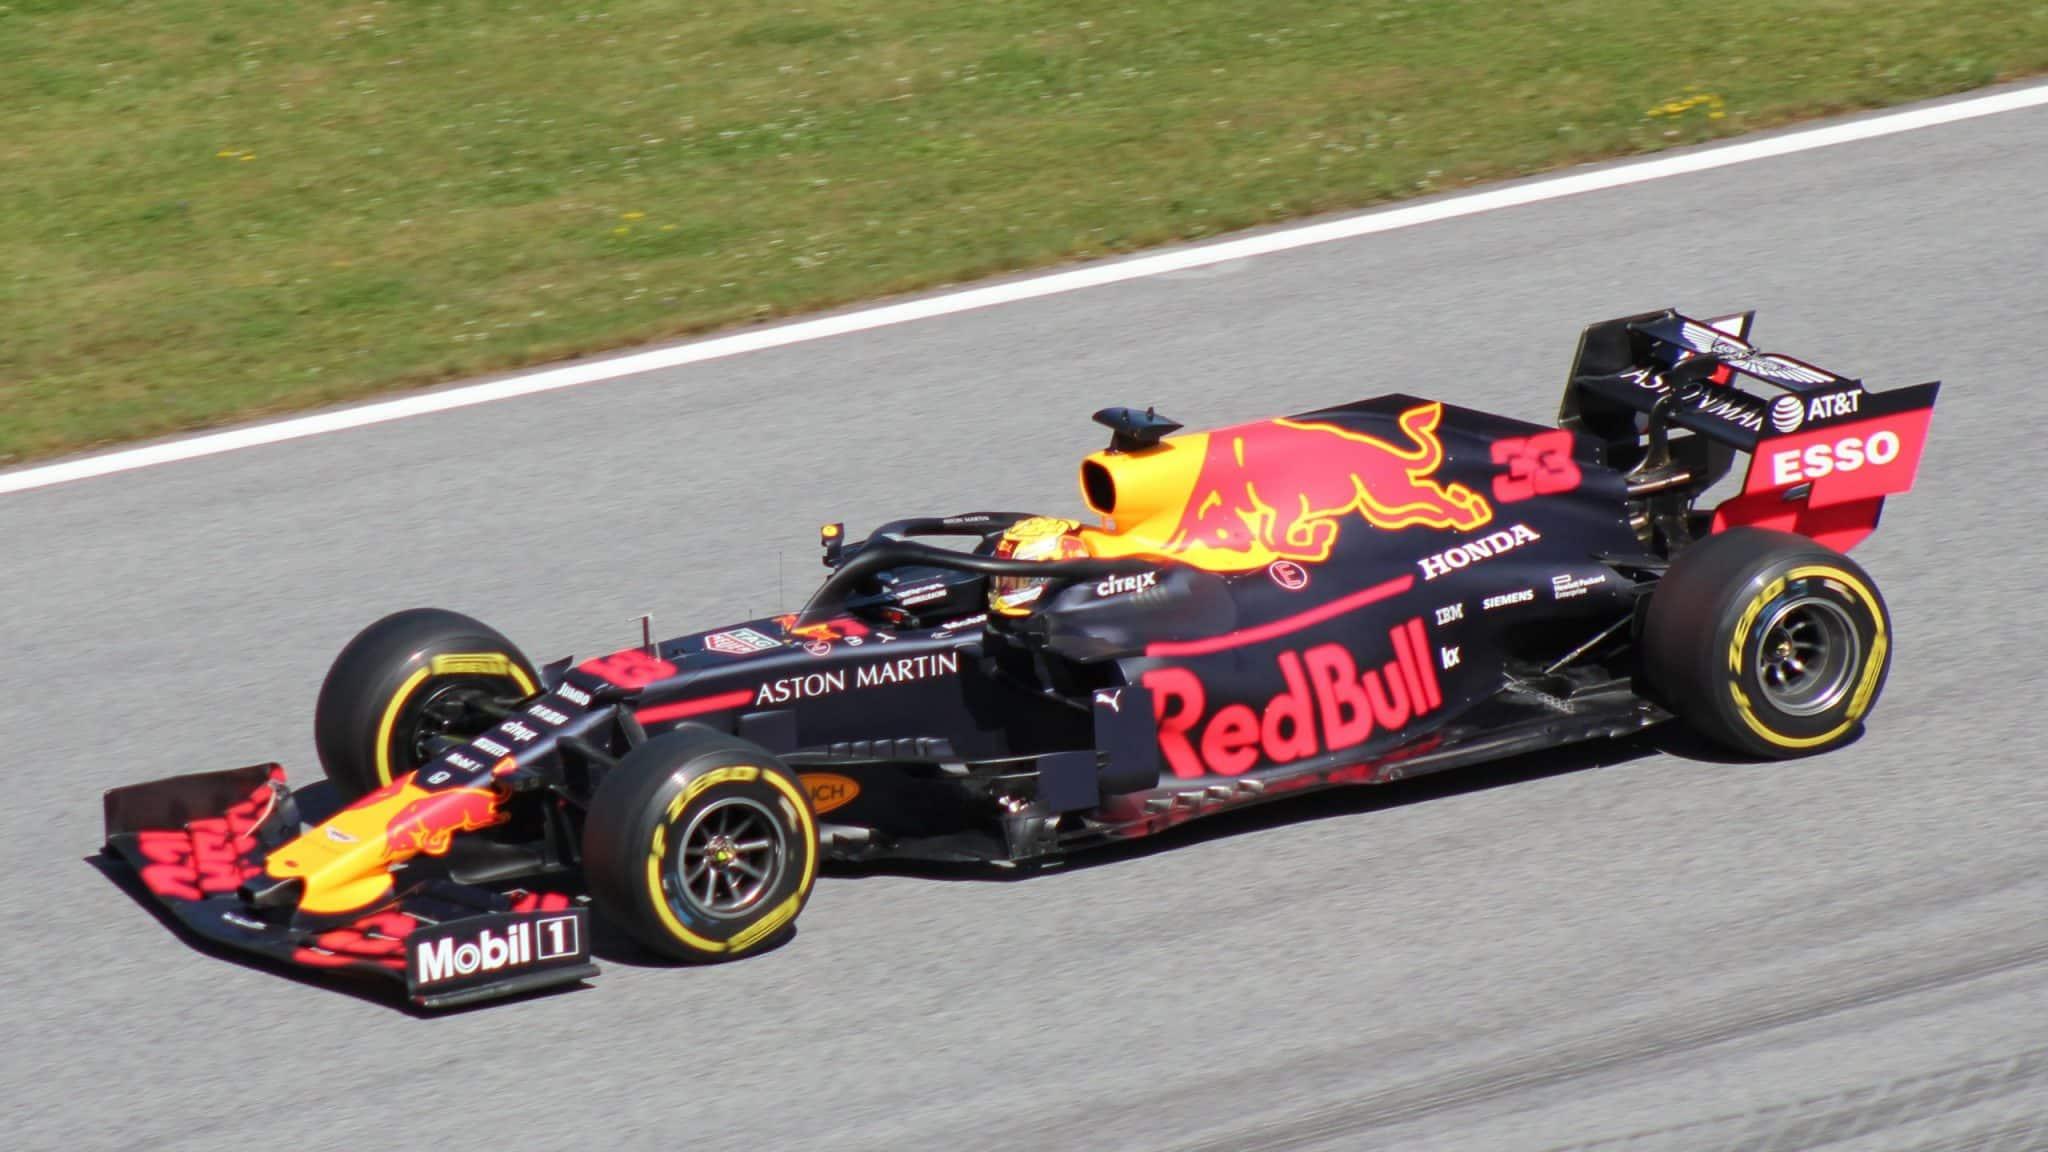 red bull_formula 1_ferrarri_mercedes